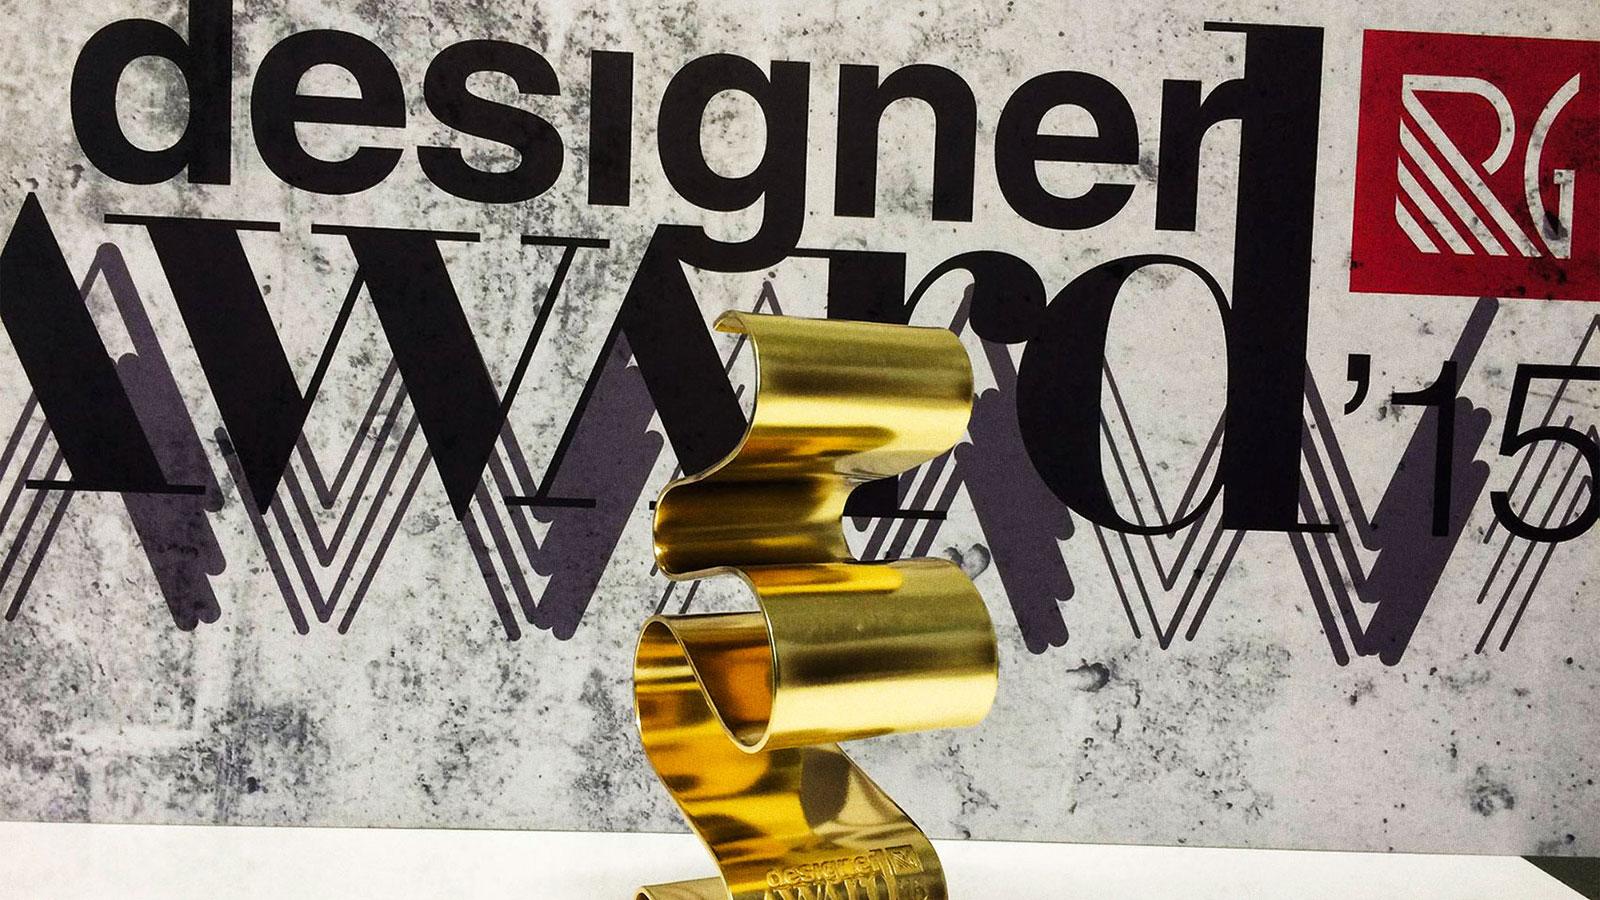 rg-designer-award-logo-1600x900-2